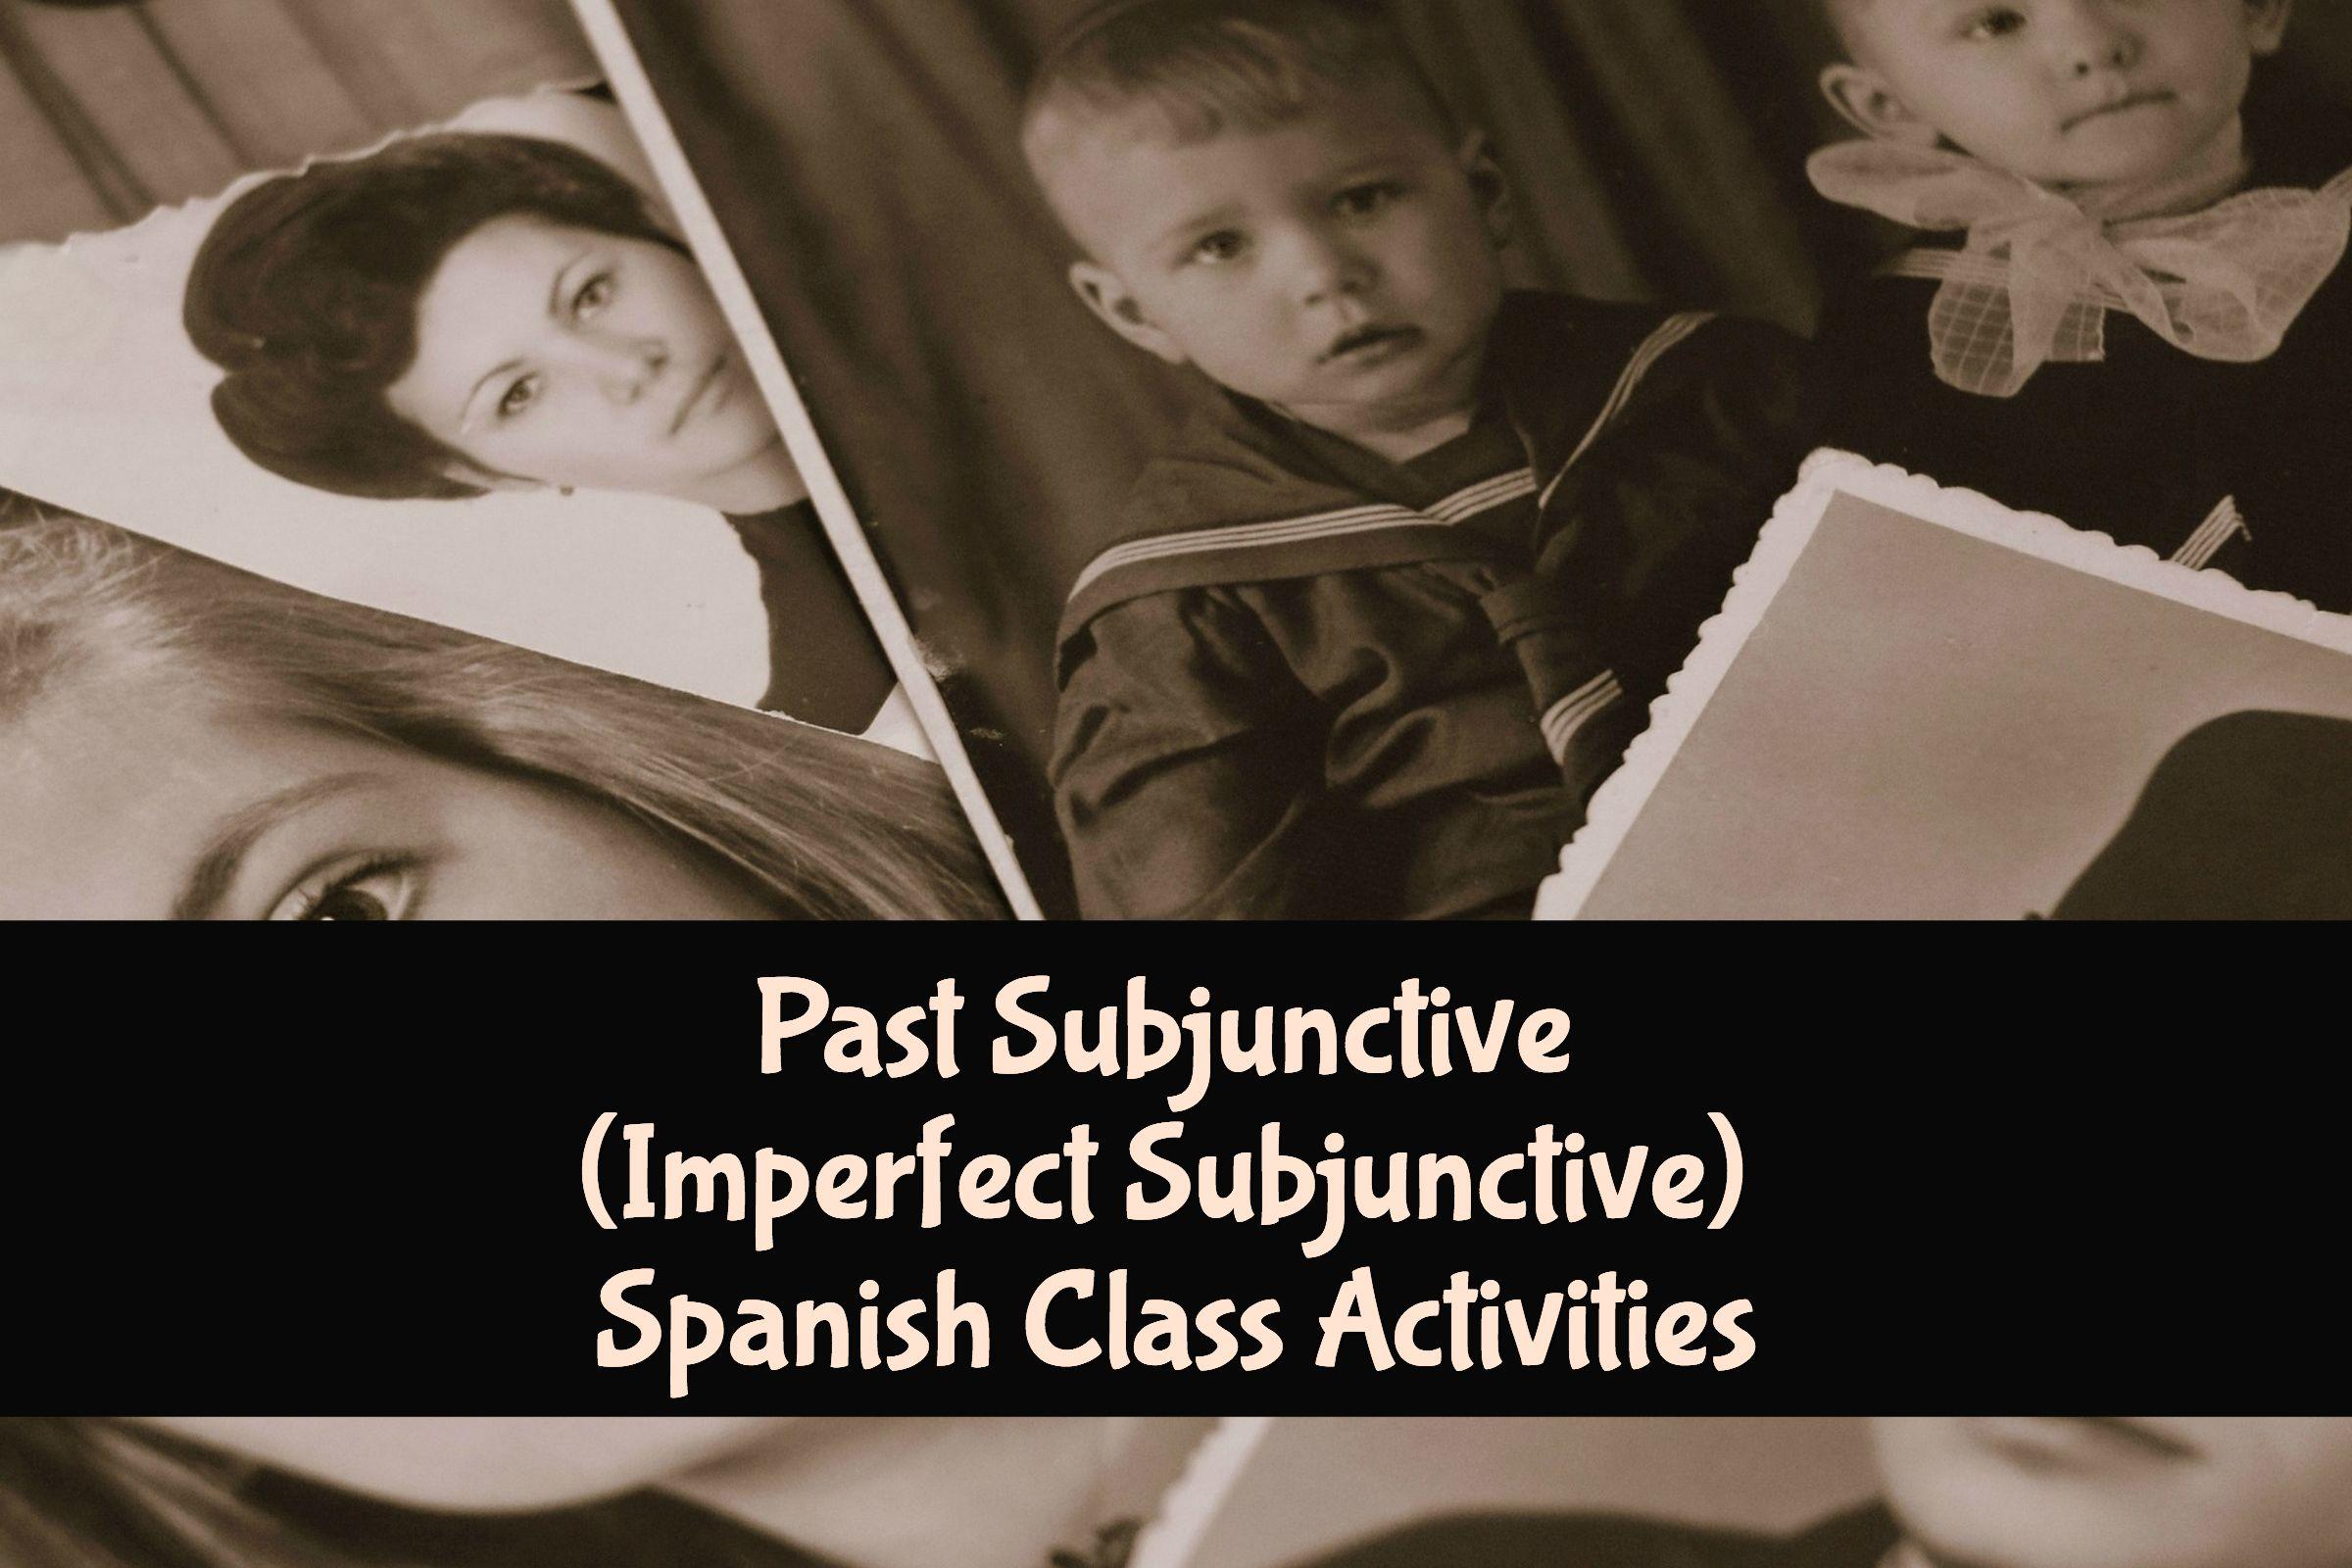 Past Subjunctive Imperfect Subjunctive Spanish Class